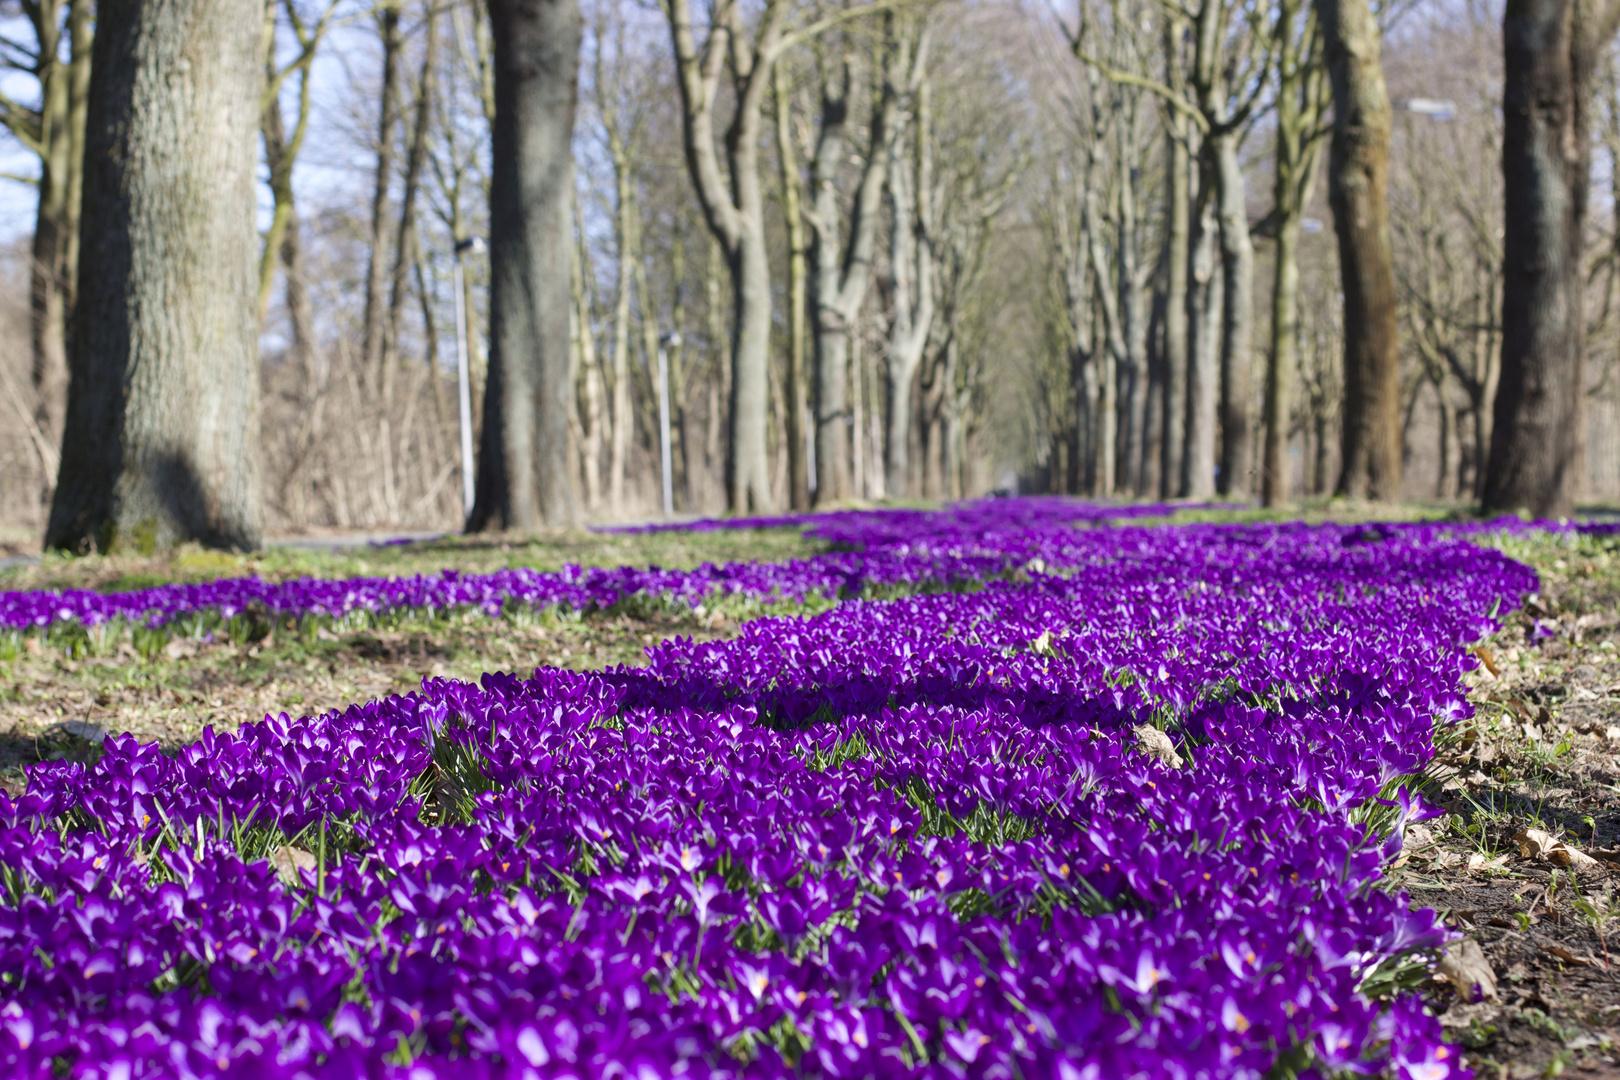 21 Million Krokusse für Oberneuland Foto & Bild   landschaft ...